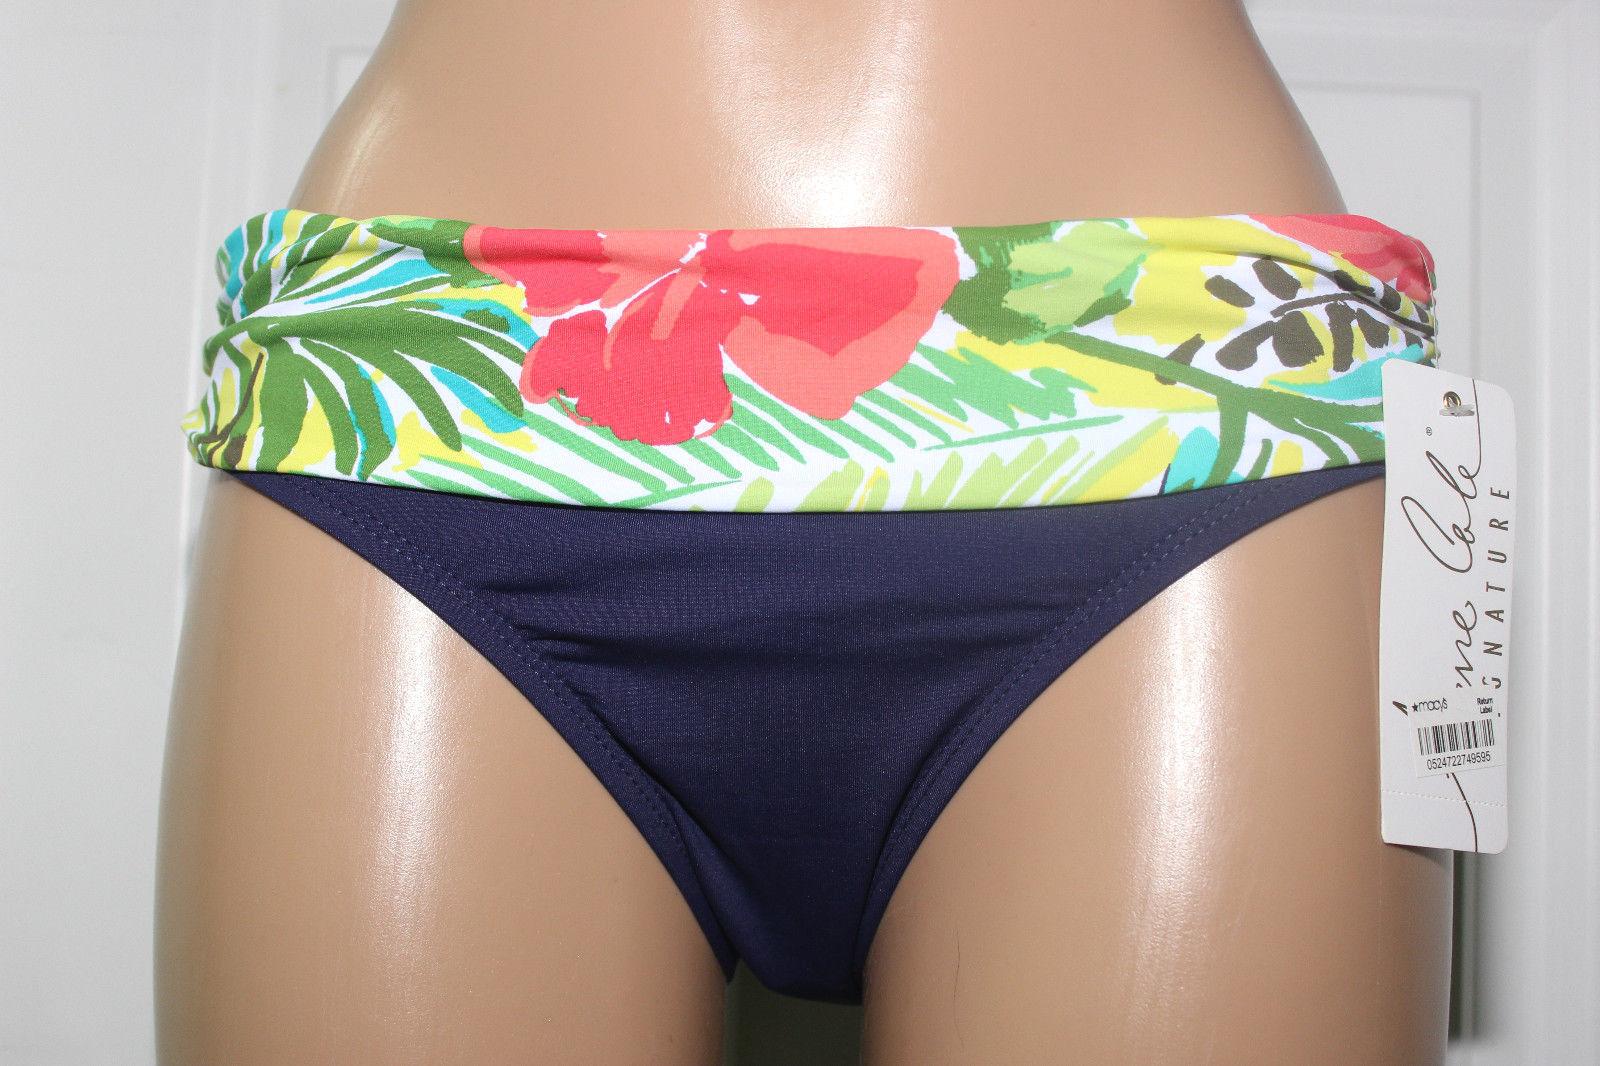 cb9107e68a8 57. 57. Previous. NEW Anne Cole 16MB391 Navy Green Multi Fold Over Banded Bikini  Bottom M Medium